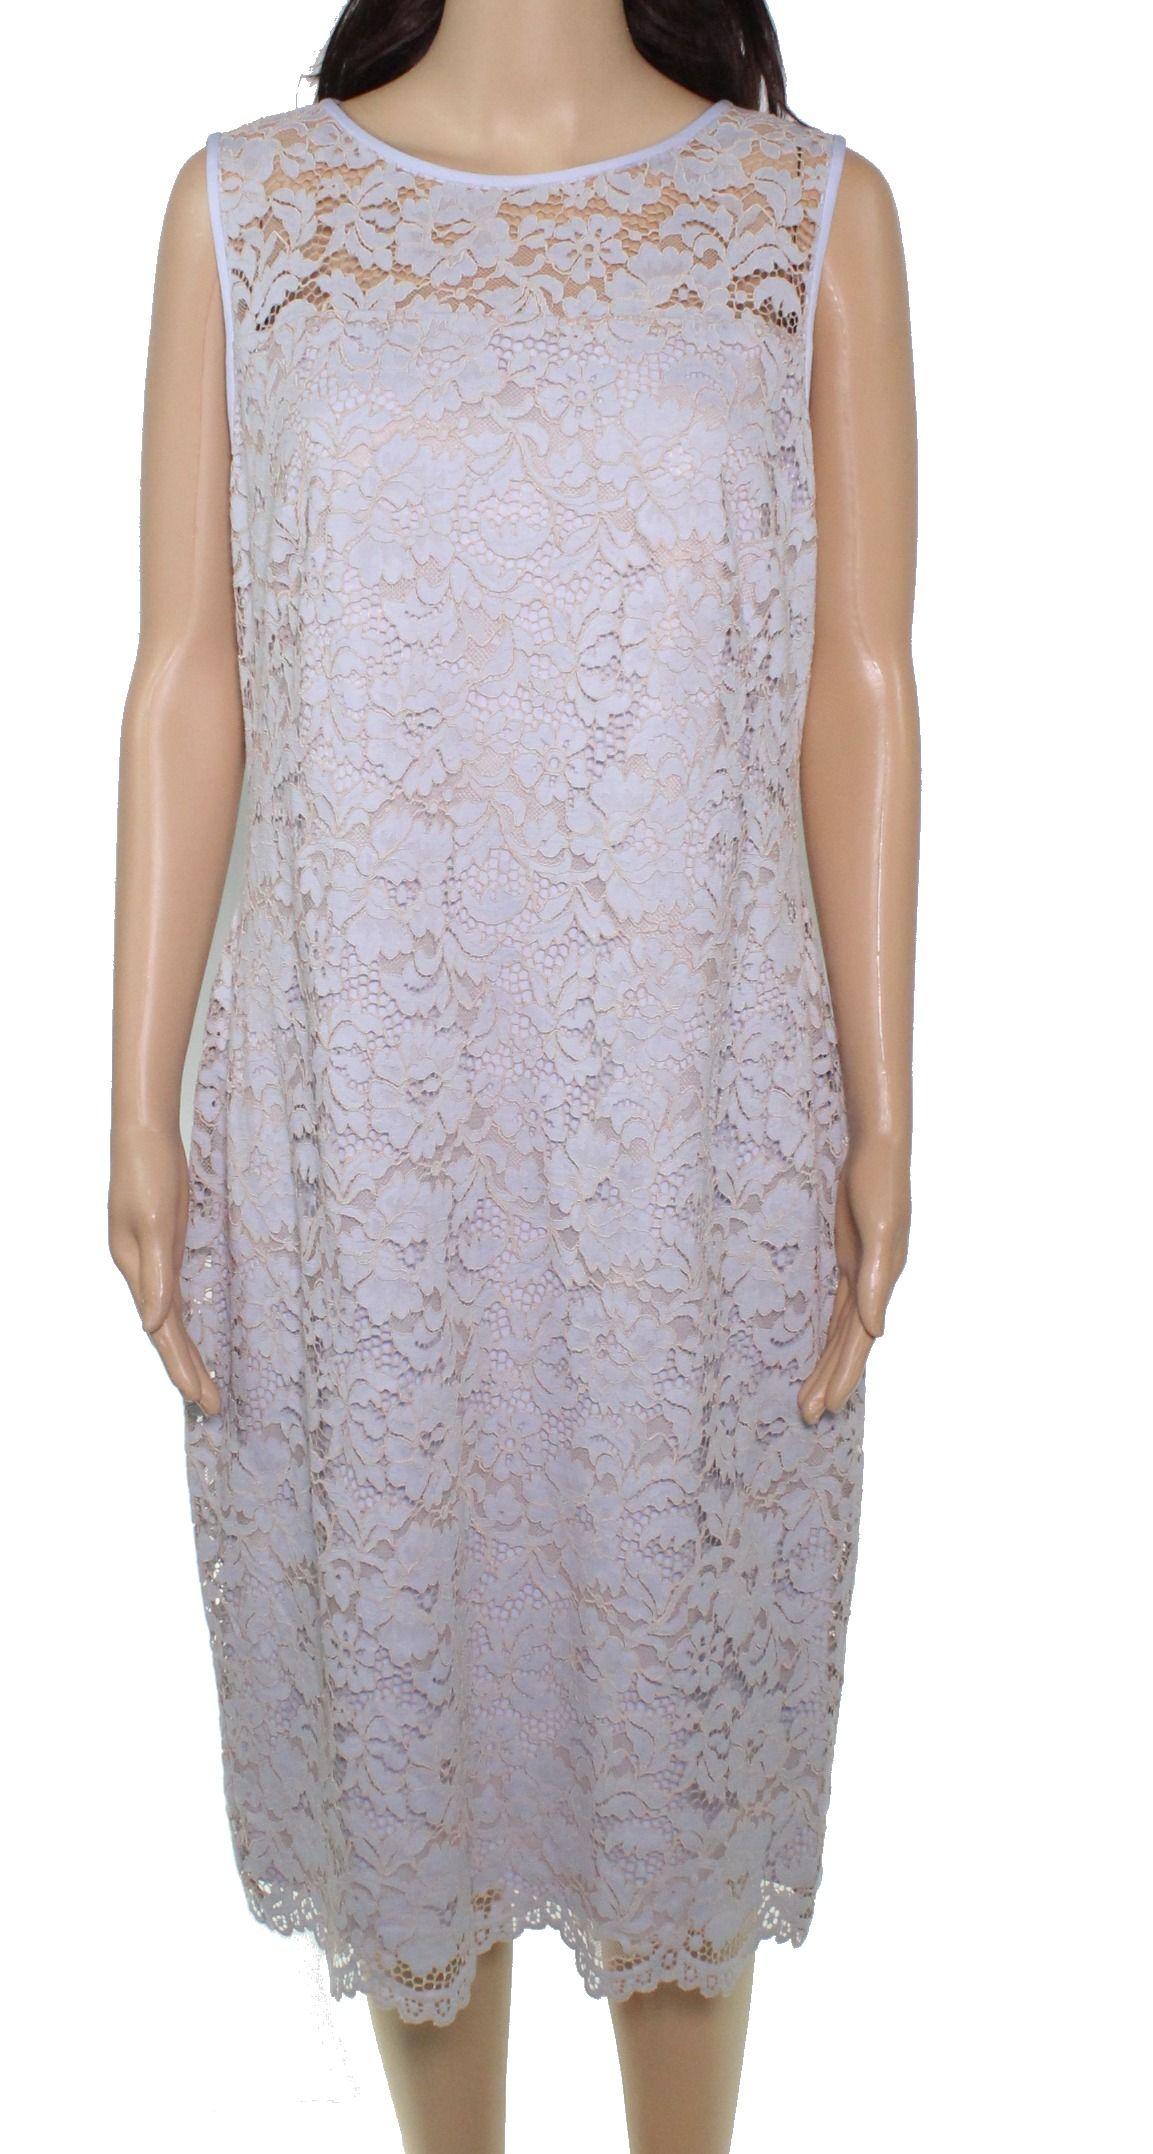 Lauren By Ralph Lauren Women's Dress Icy Blue Size 2 Sheath Lace